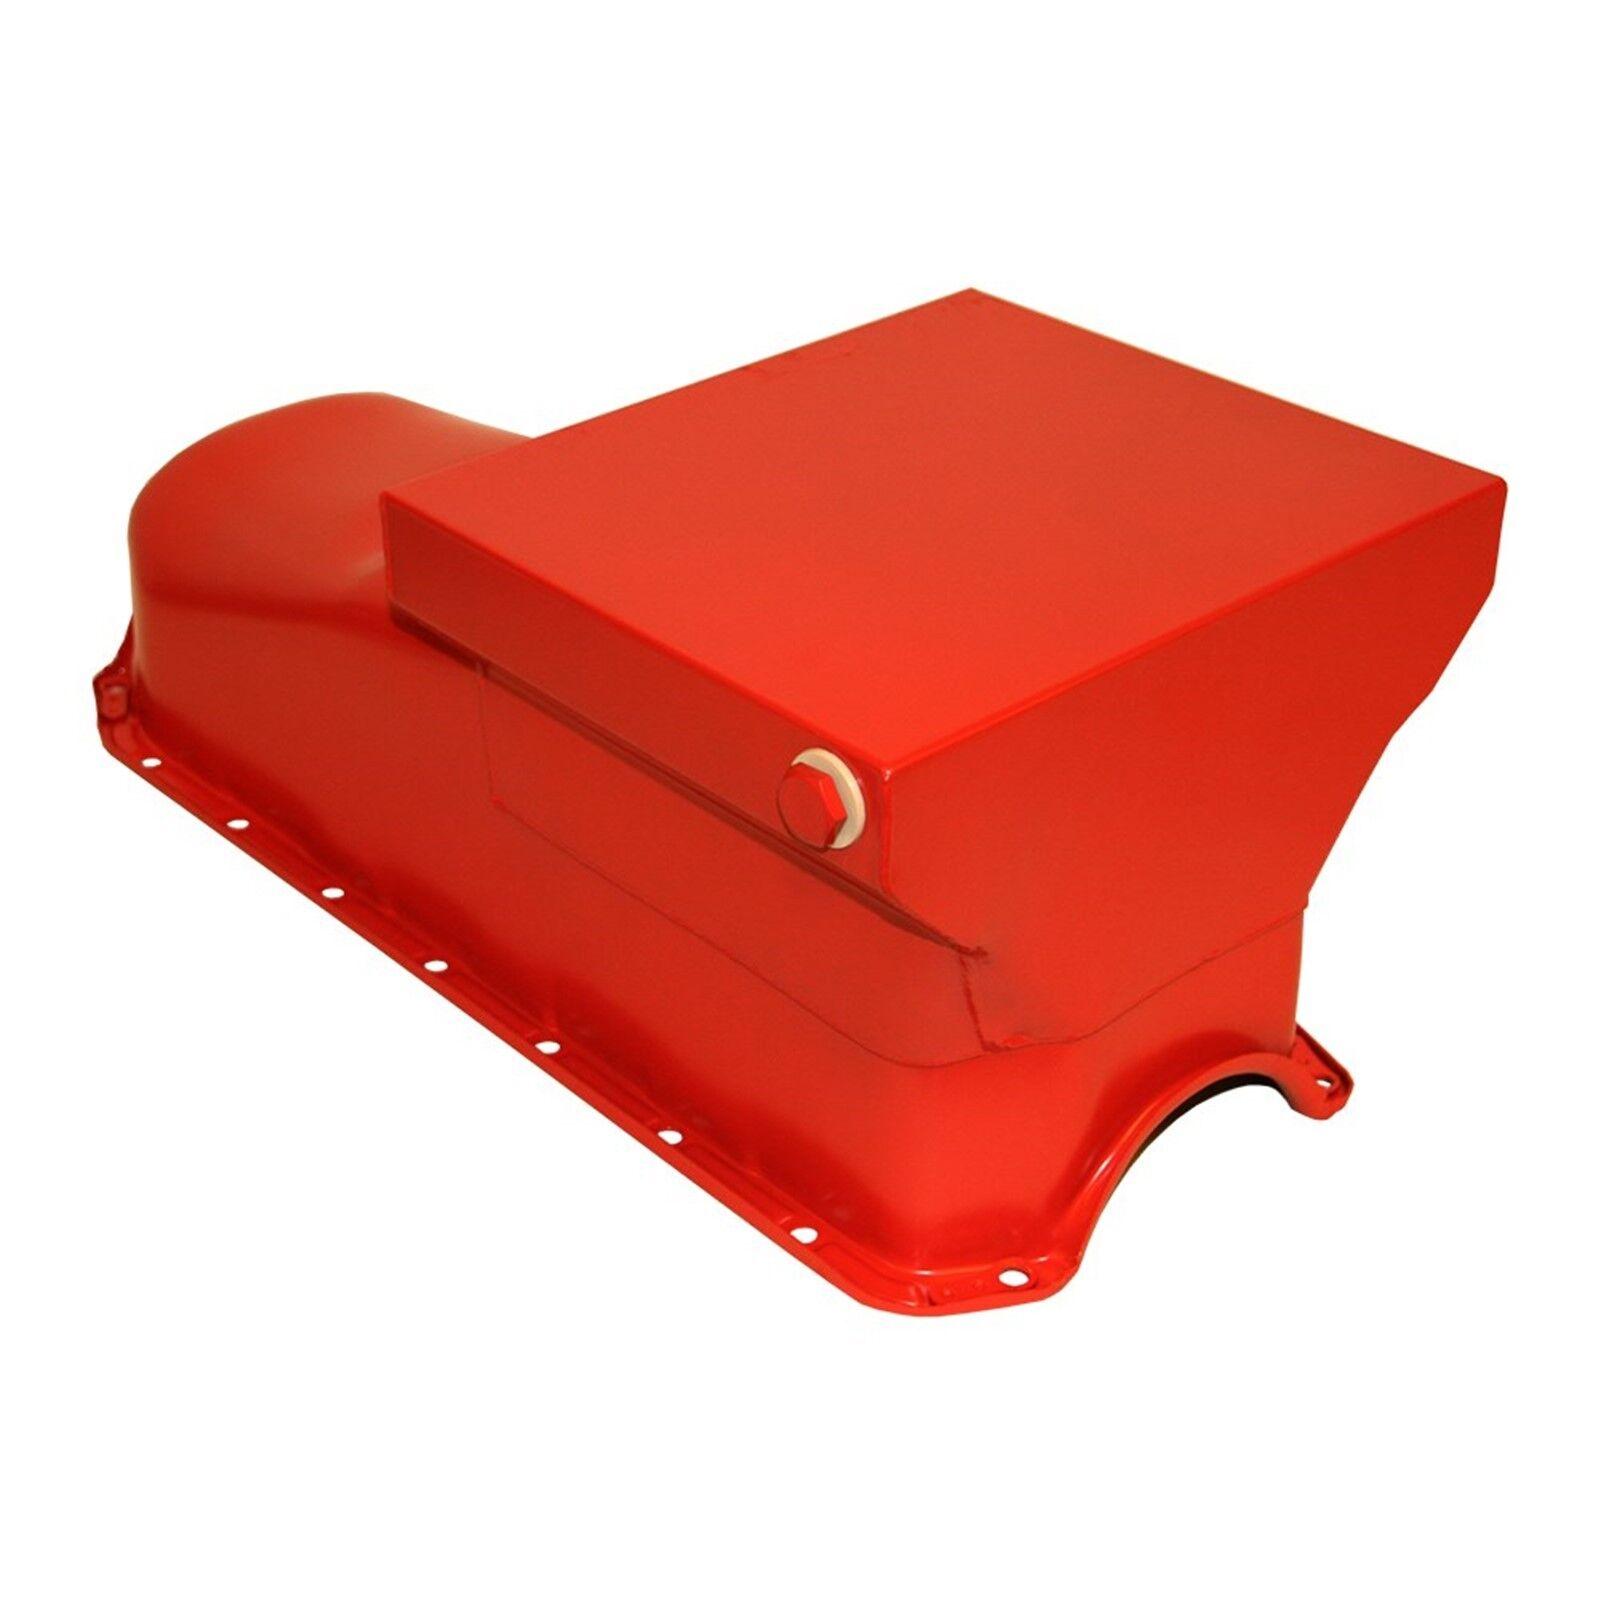 Orange Drag Race Style Oil Pan 7qt - 58-79 SBC Chevy 283 327 350 400 Small Block